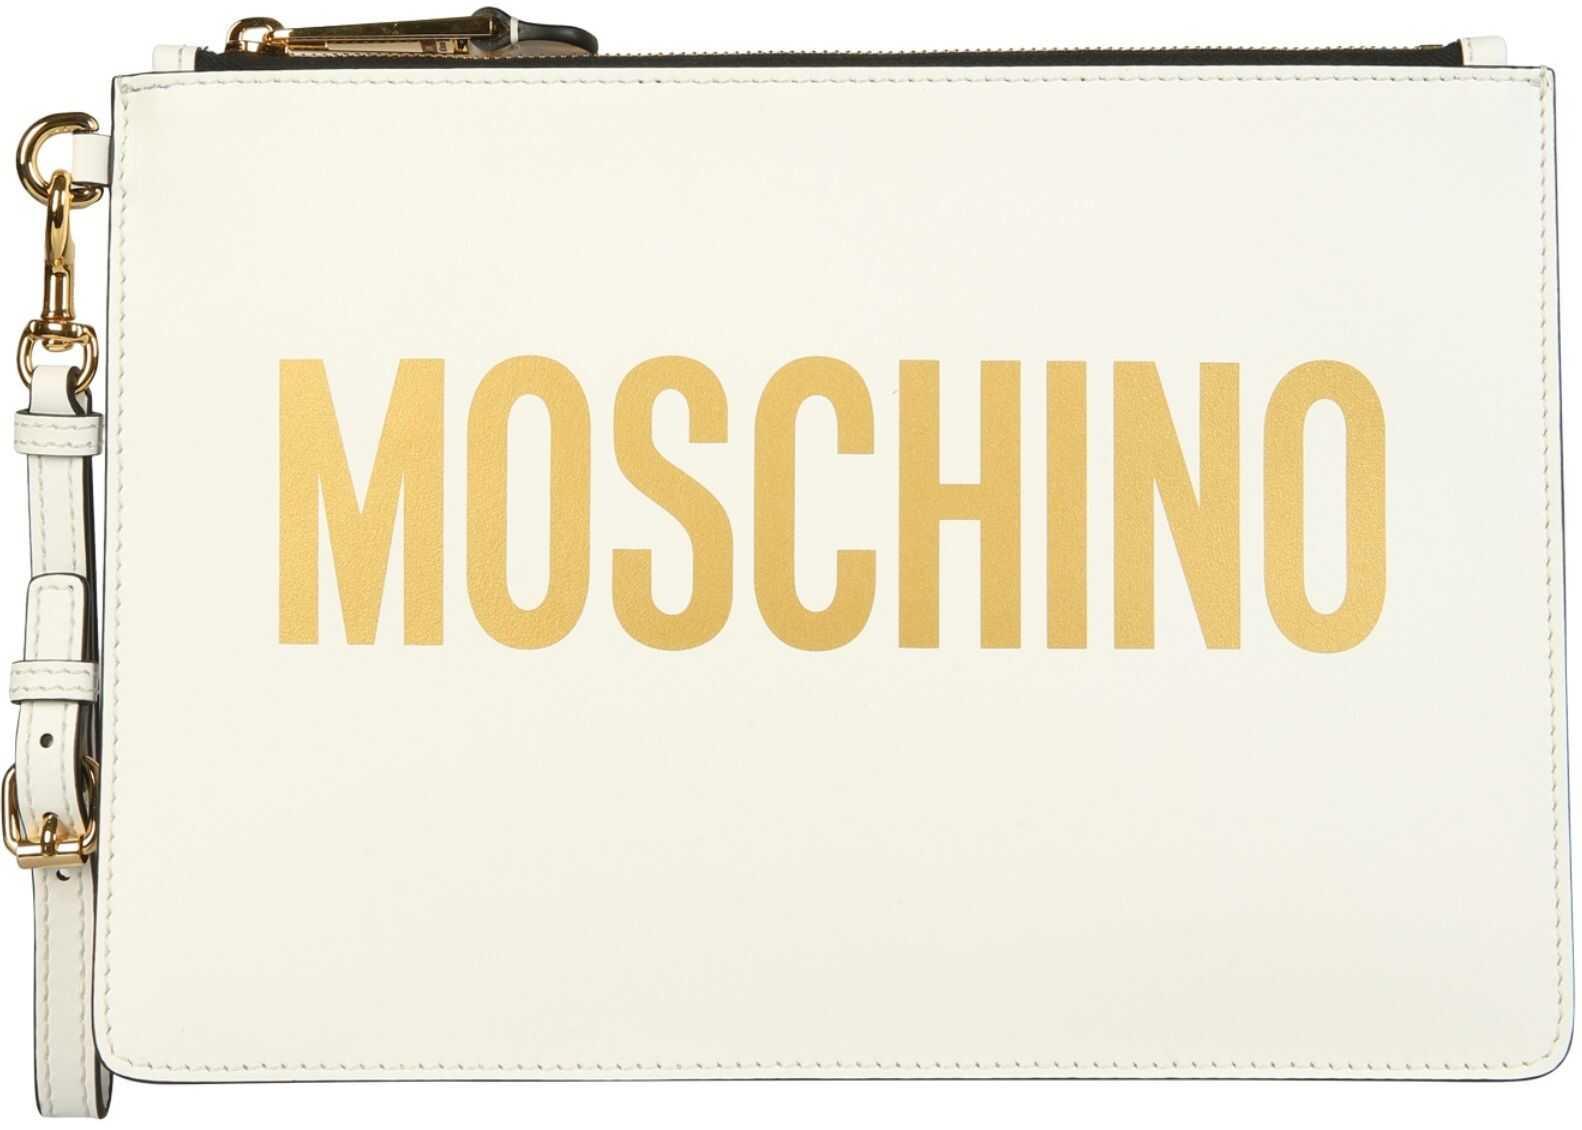 Moschino Pouch With Maxi Logo 84058001_4001 WHITE imagine b-mall.ro